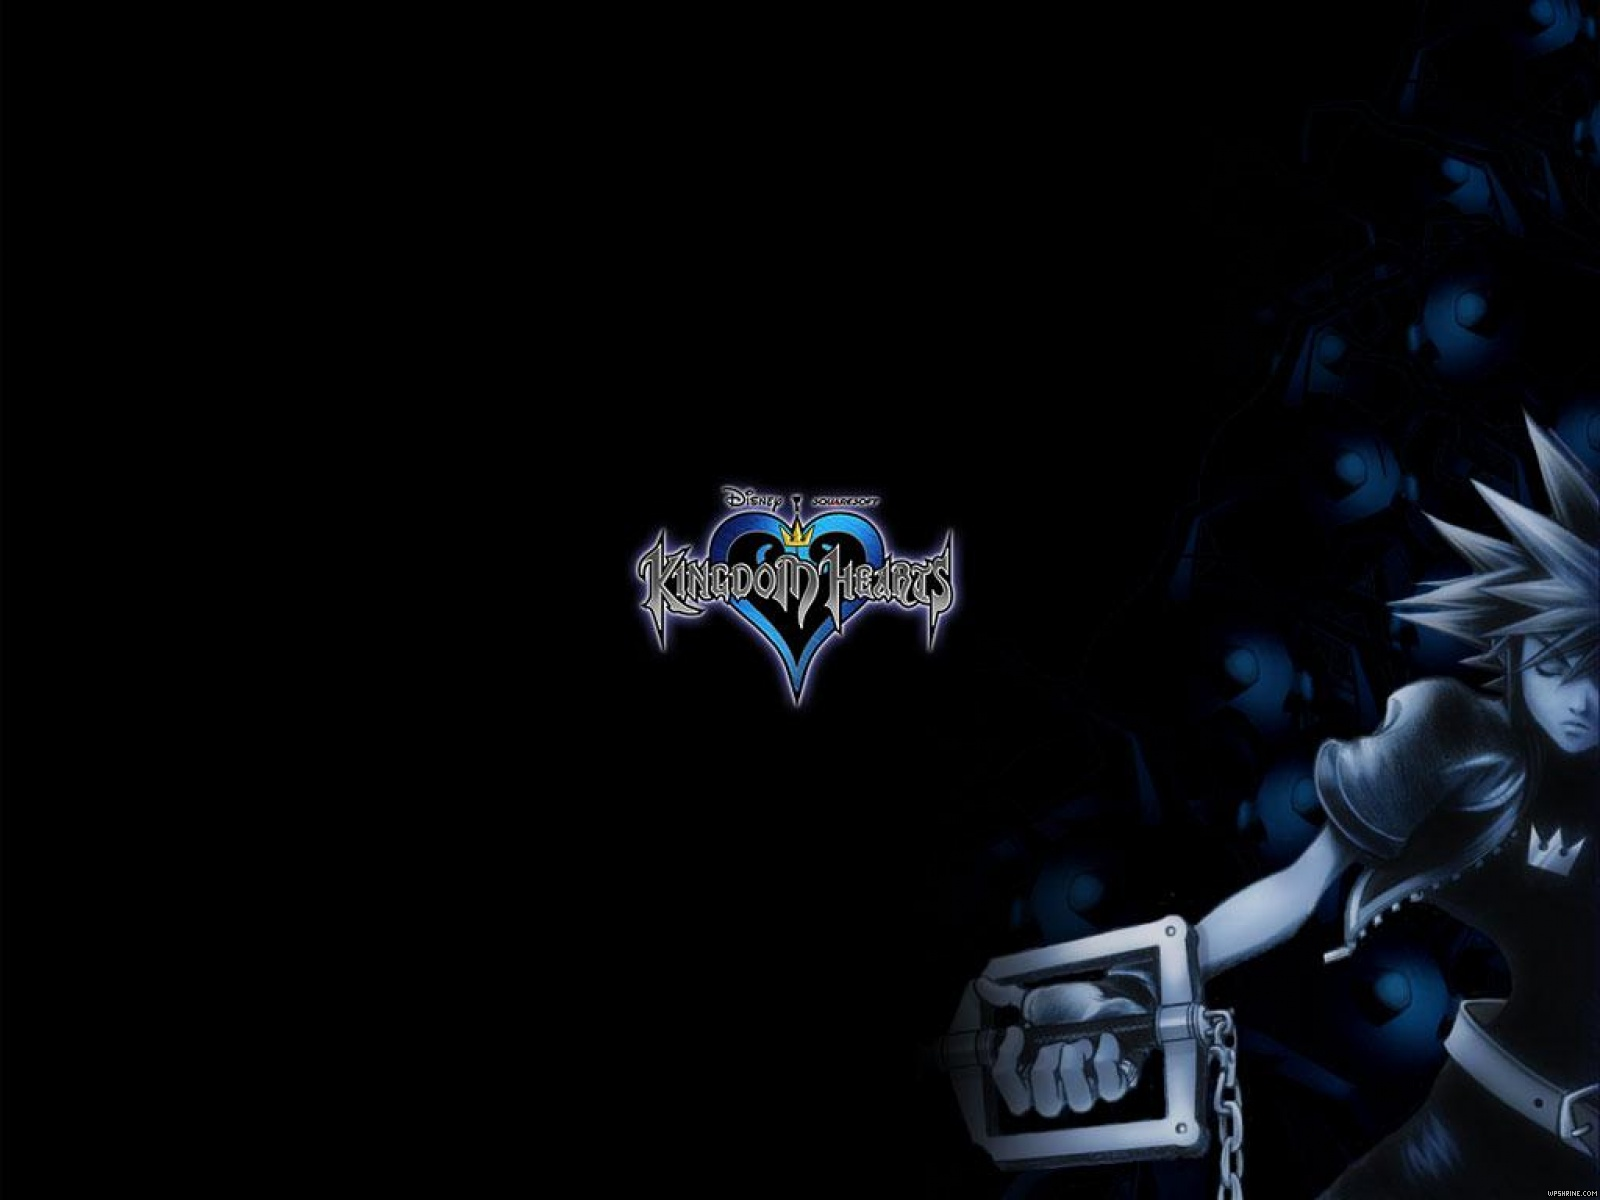 Kingdom Hearts Wallpaper Hd Kingdom Hearts 3 Wallpaper Hd